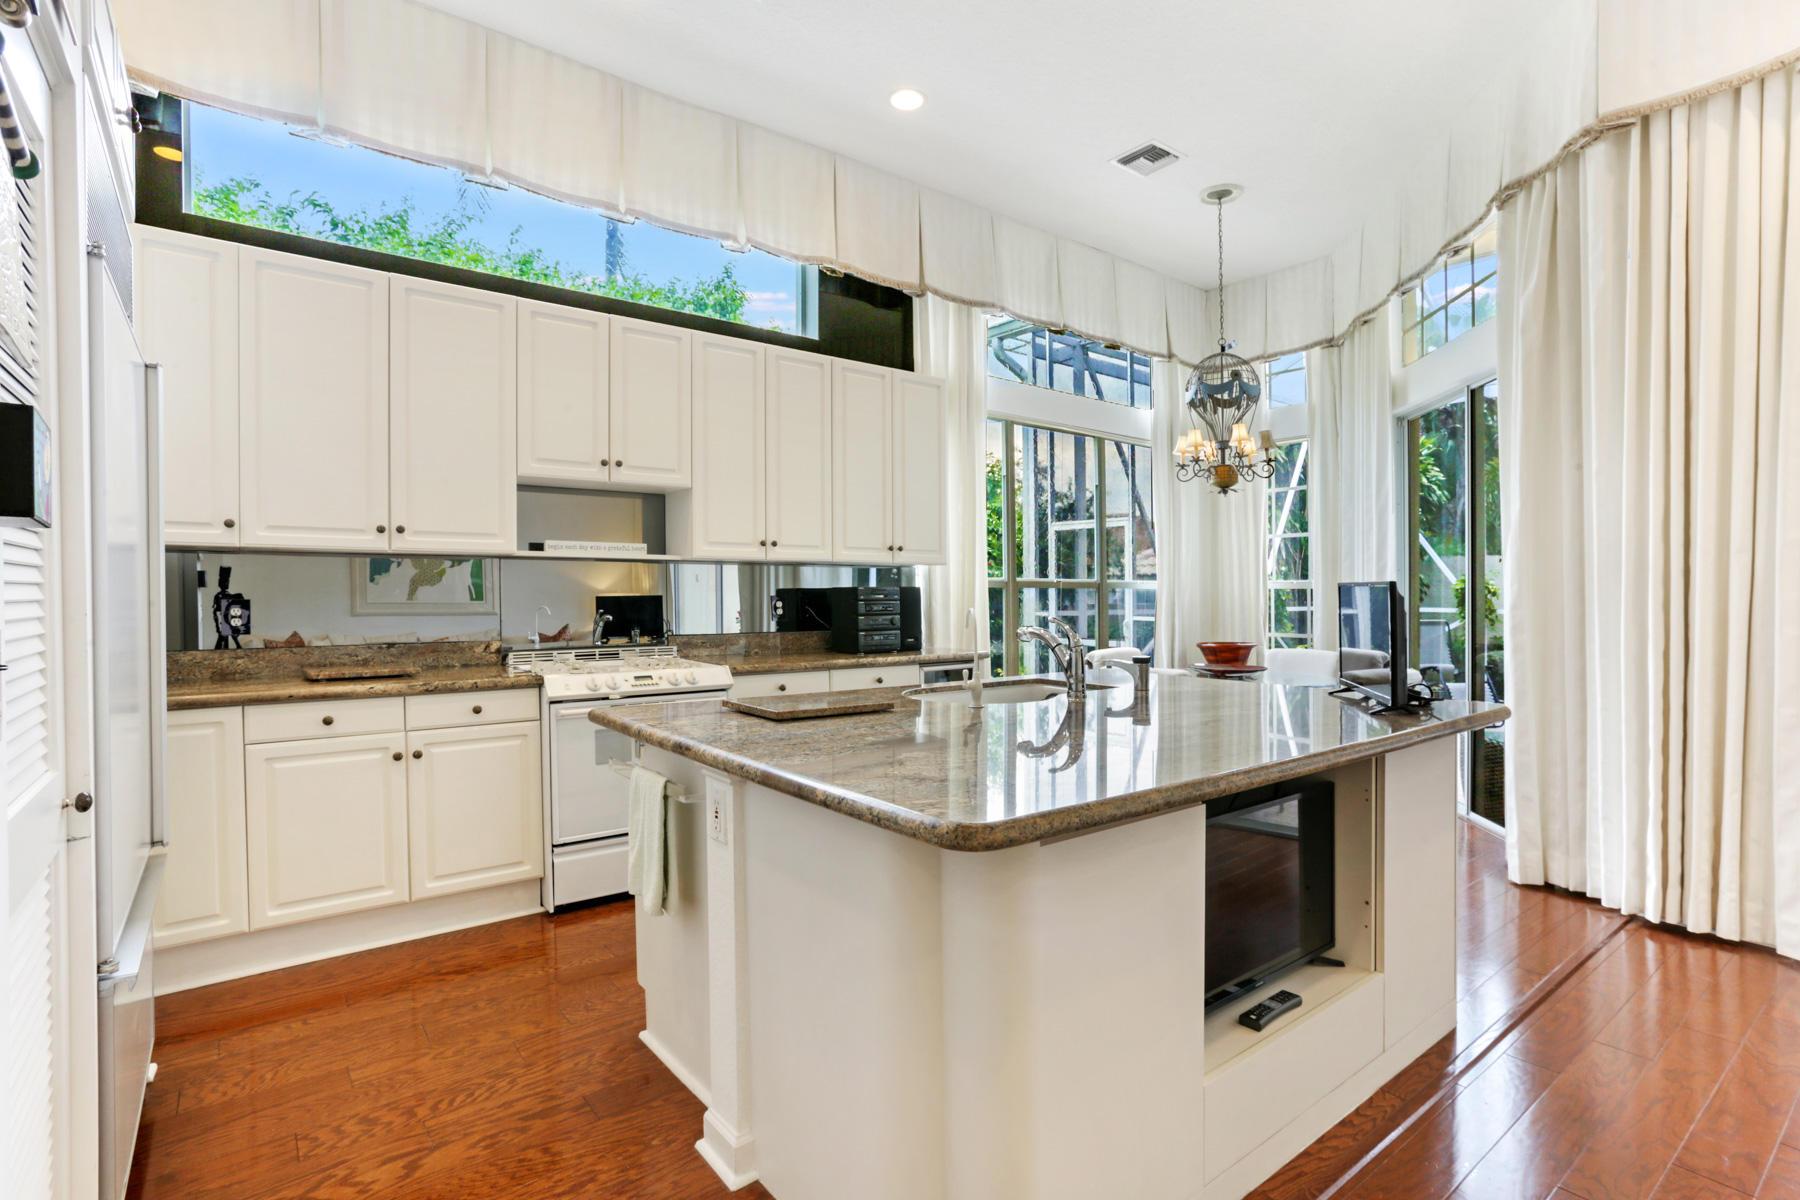 201 Coral Cay Terrace, Palm Beach Gardens, Florida 33418, 3 Bedrooms Bedrooms, ,3 BathroomsBathrooms,A,Single family,Coral Cay,RX-10452353